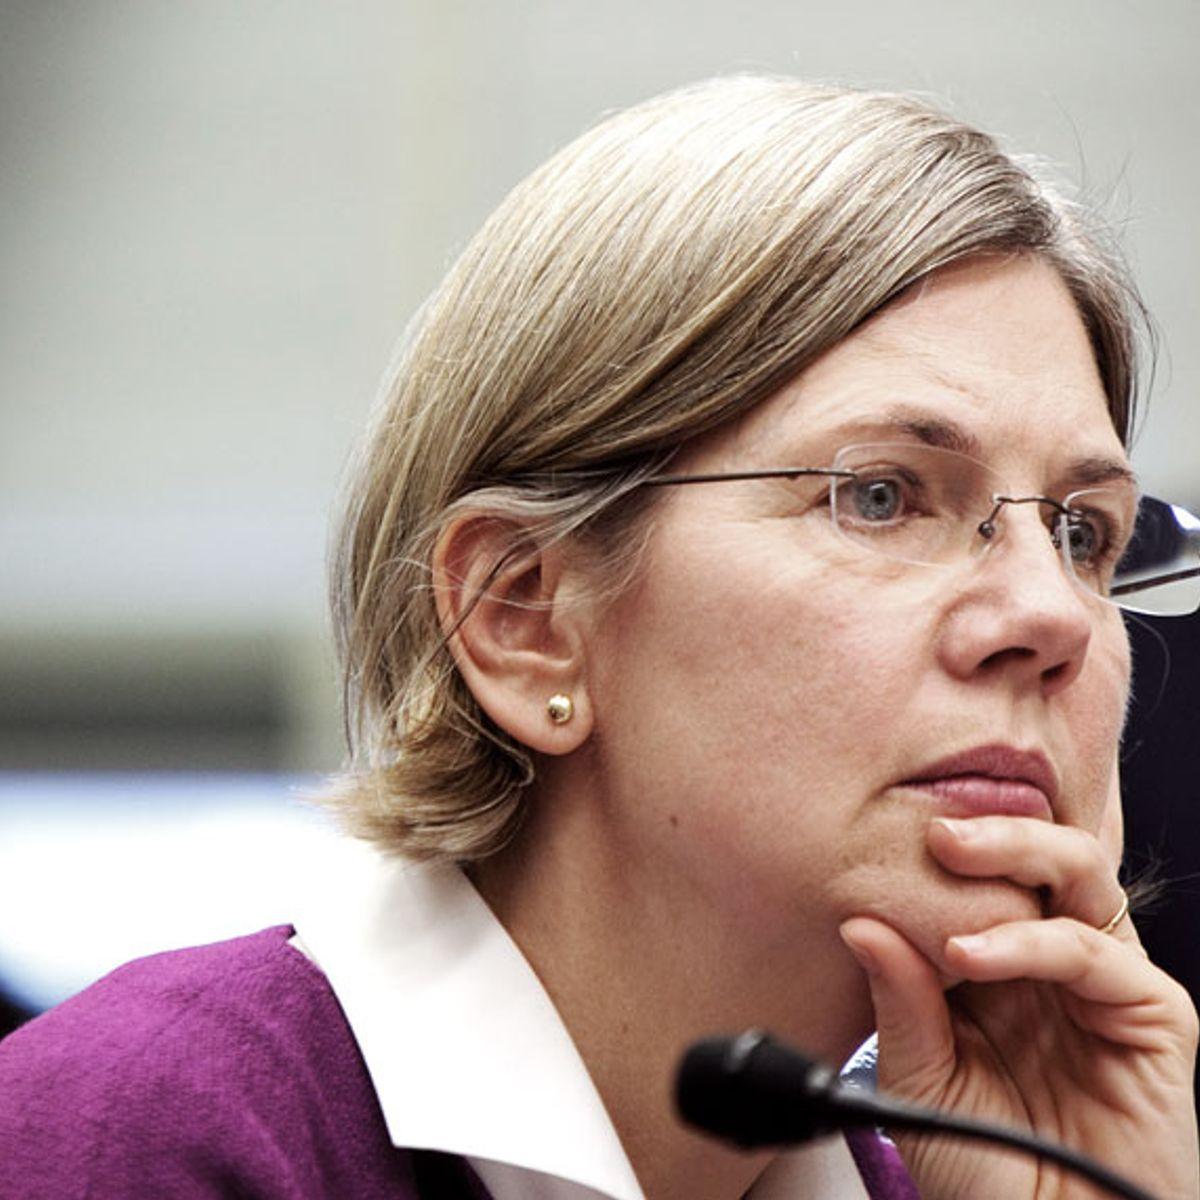 The powerful new idea in Elizabeth Warren's labor platform